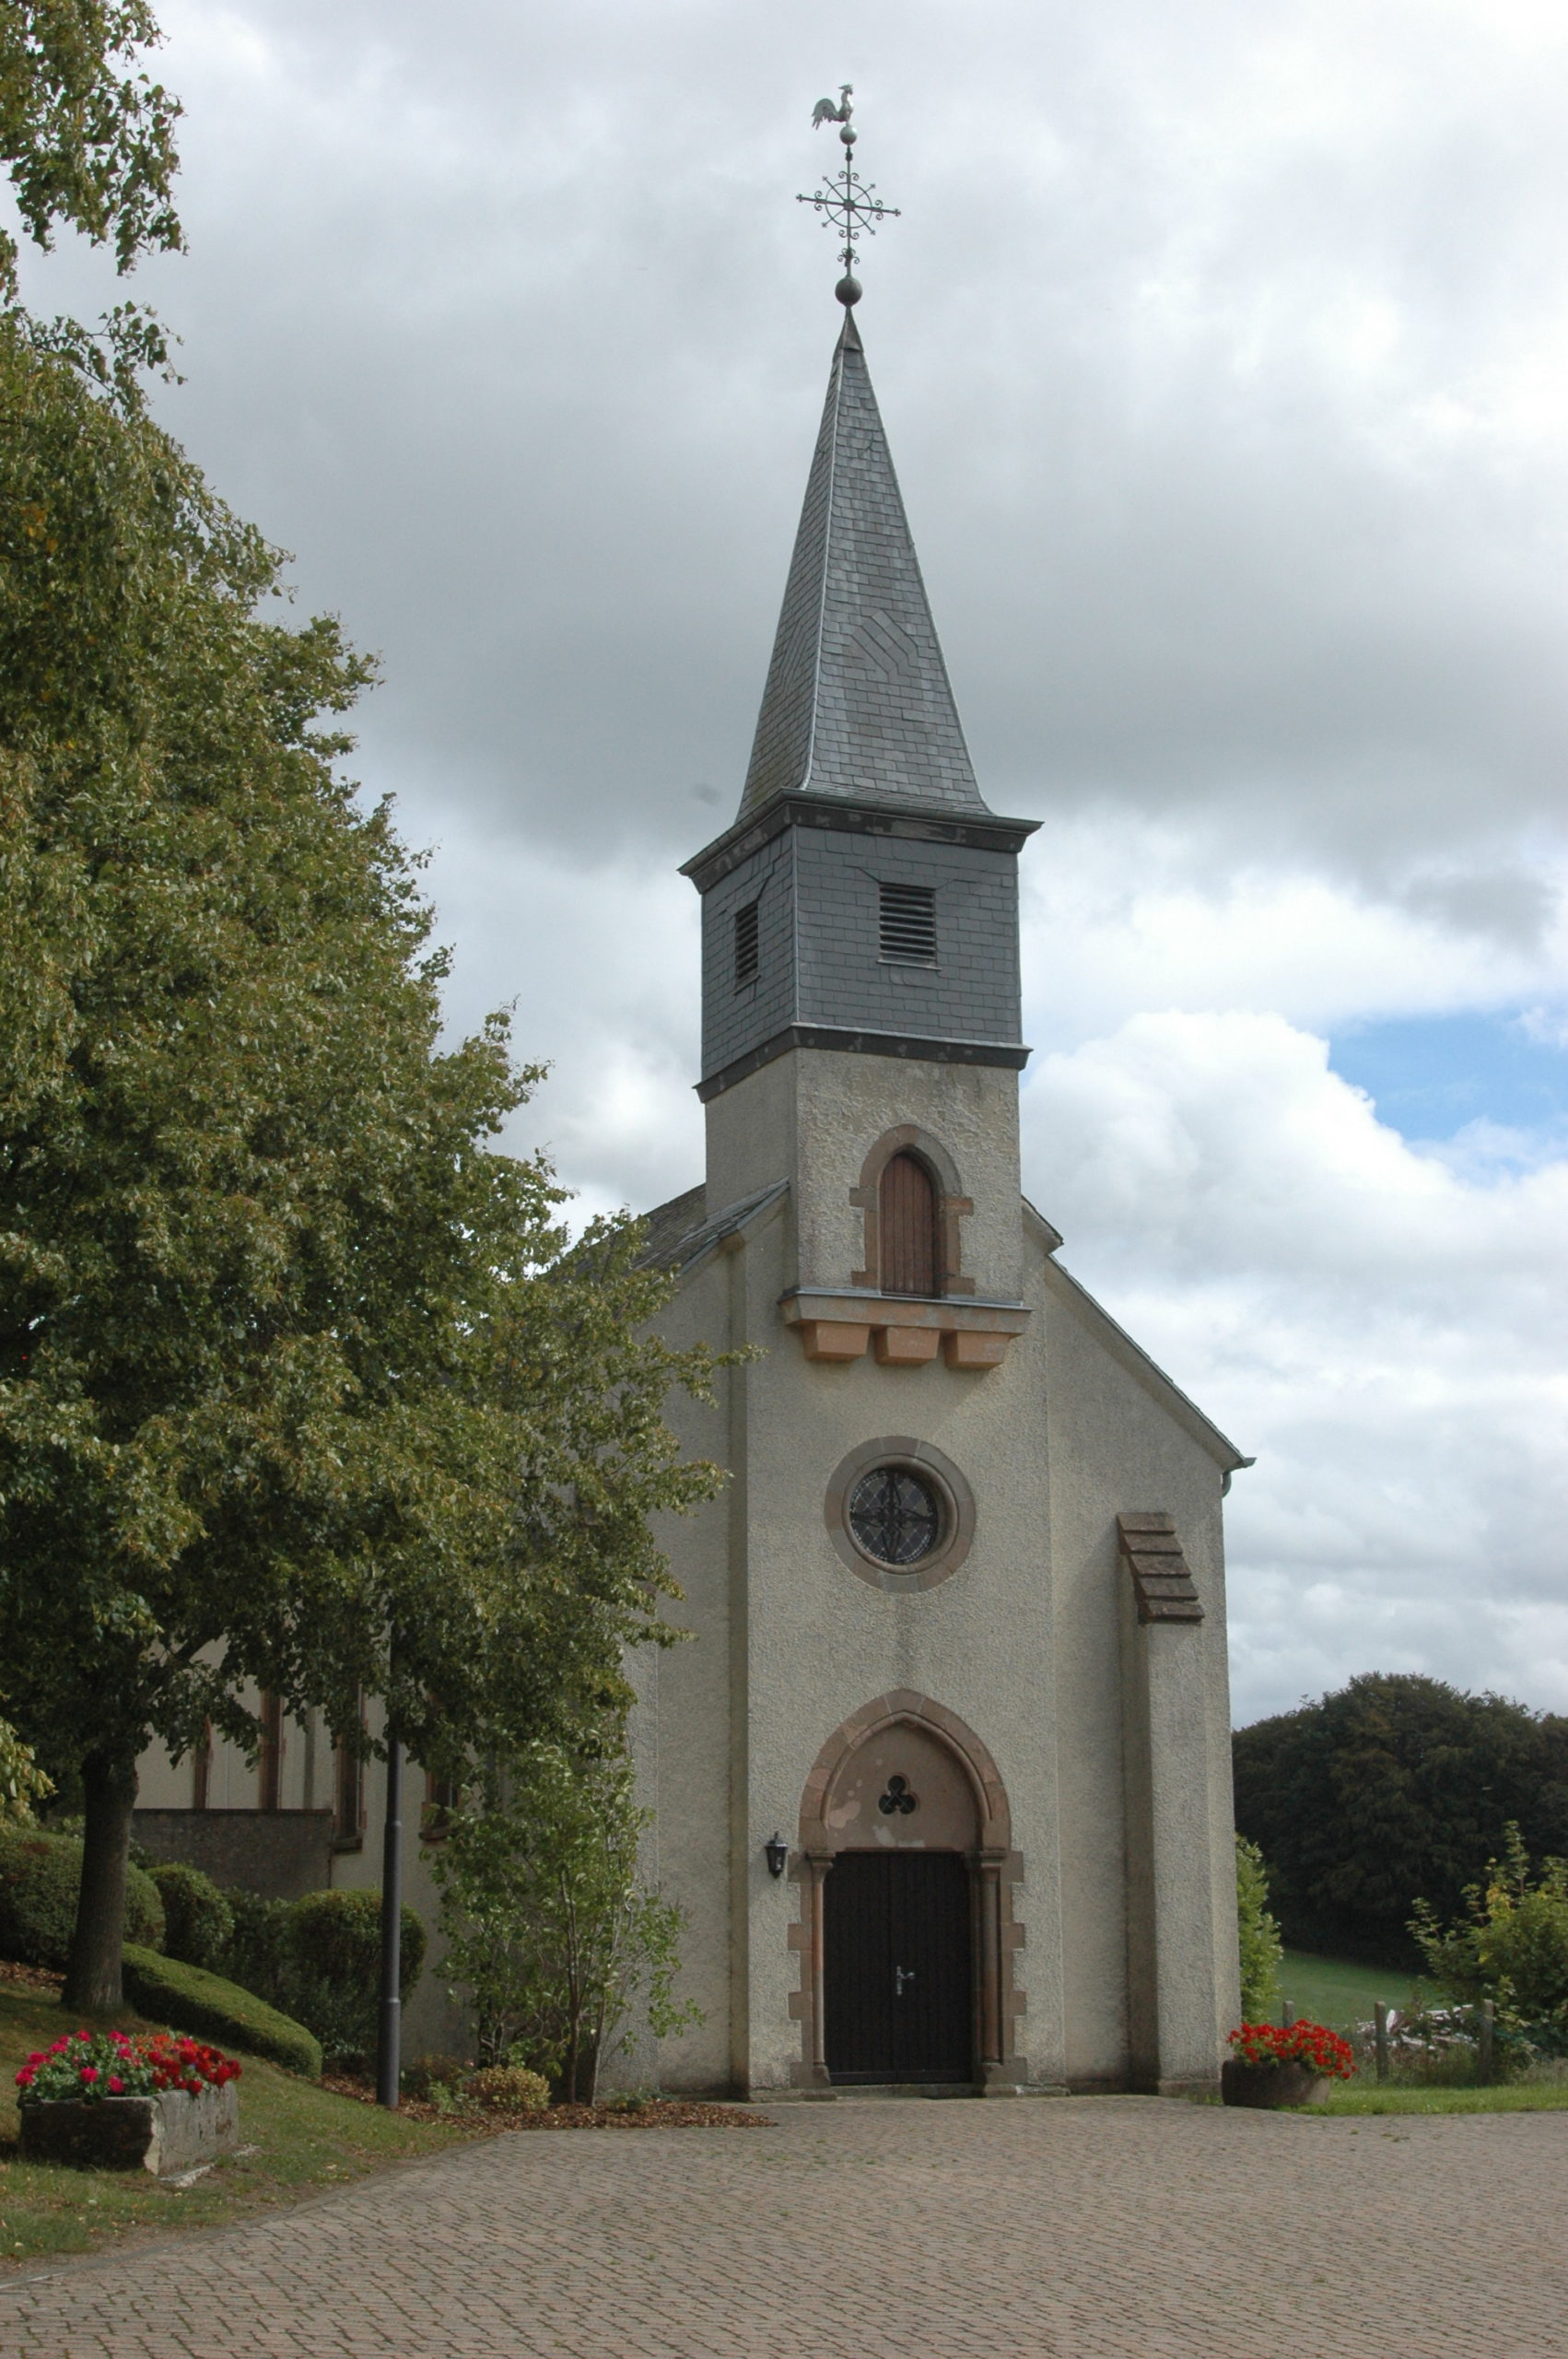 Grümelscheid église